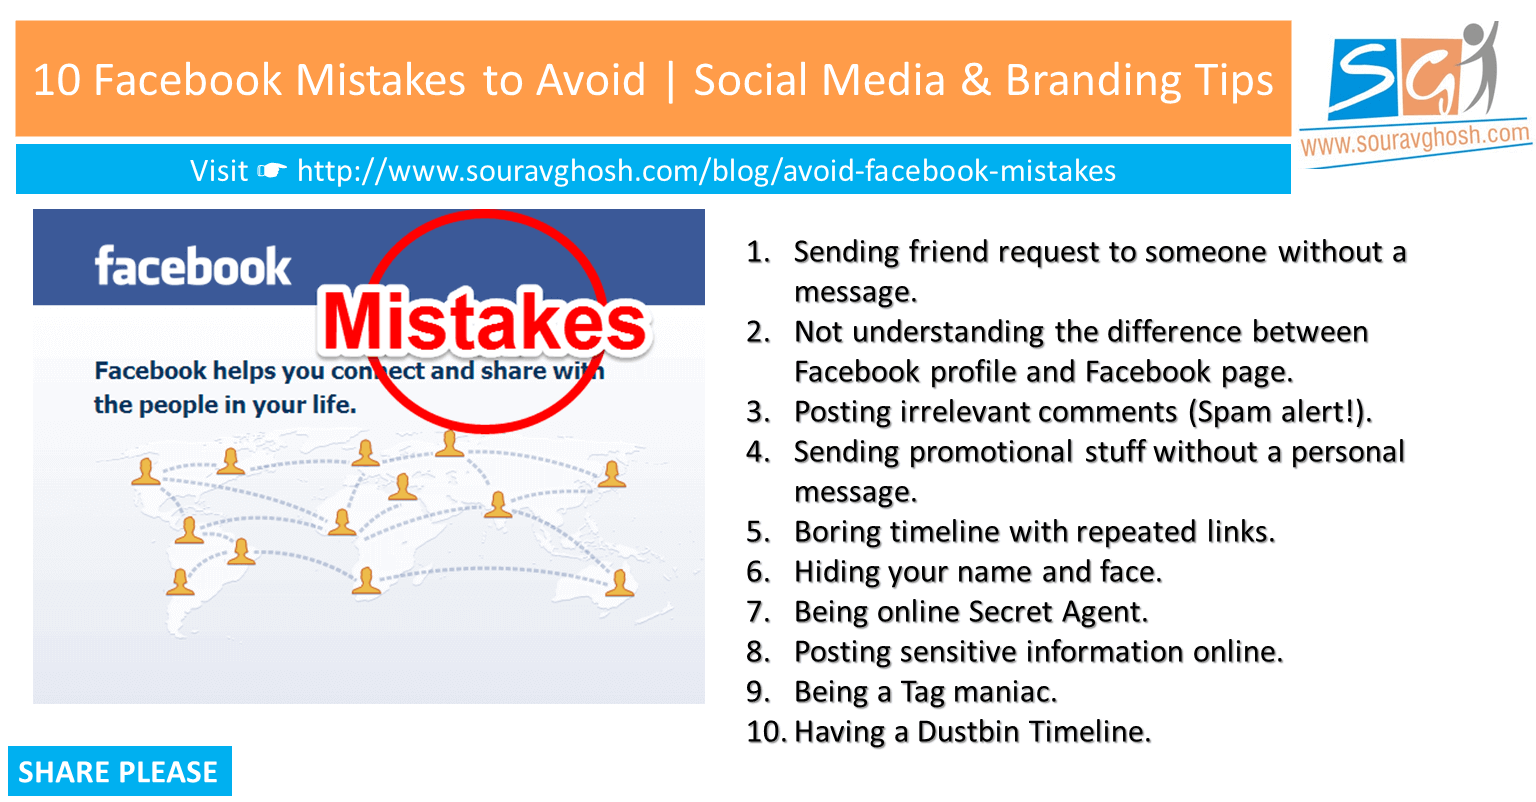 10 Facebook Mistakes to Avoid